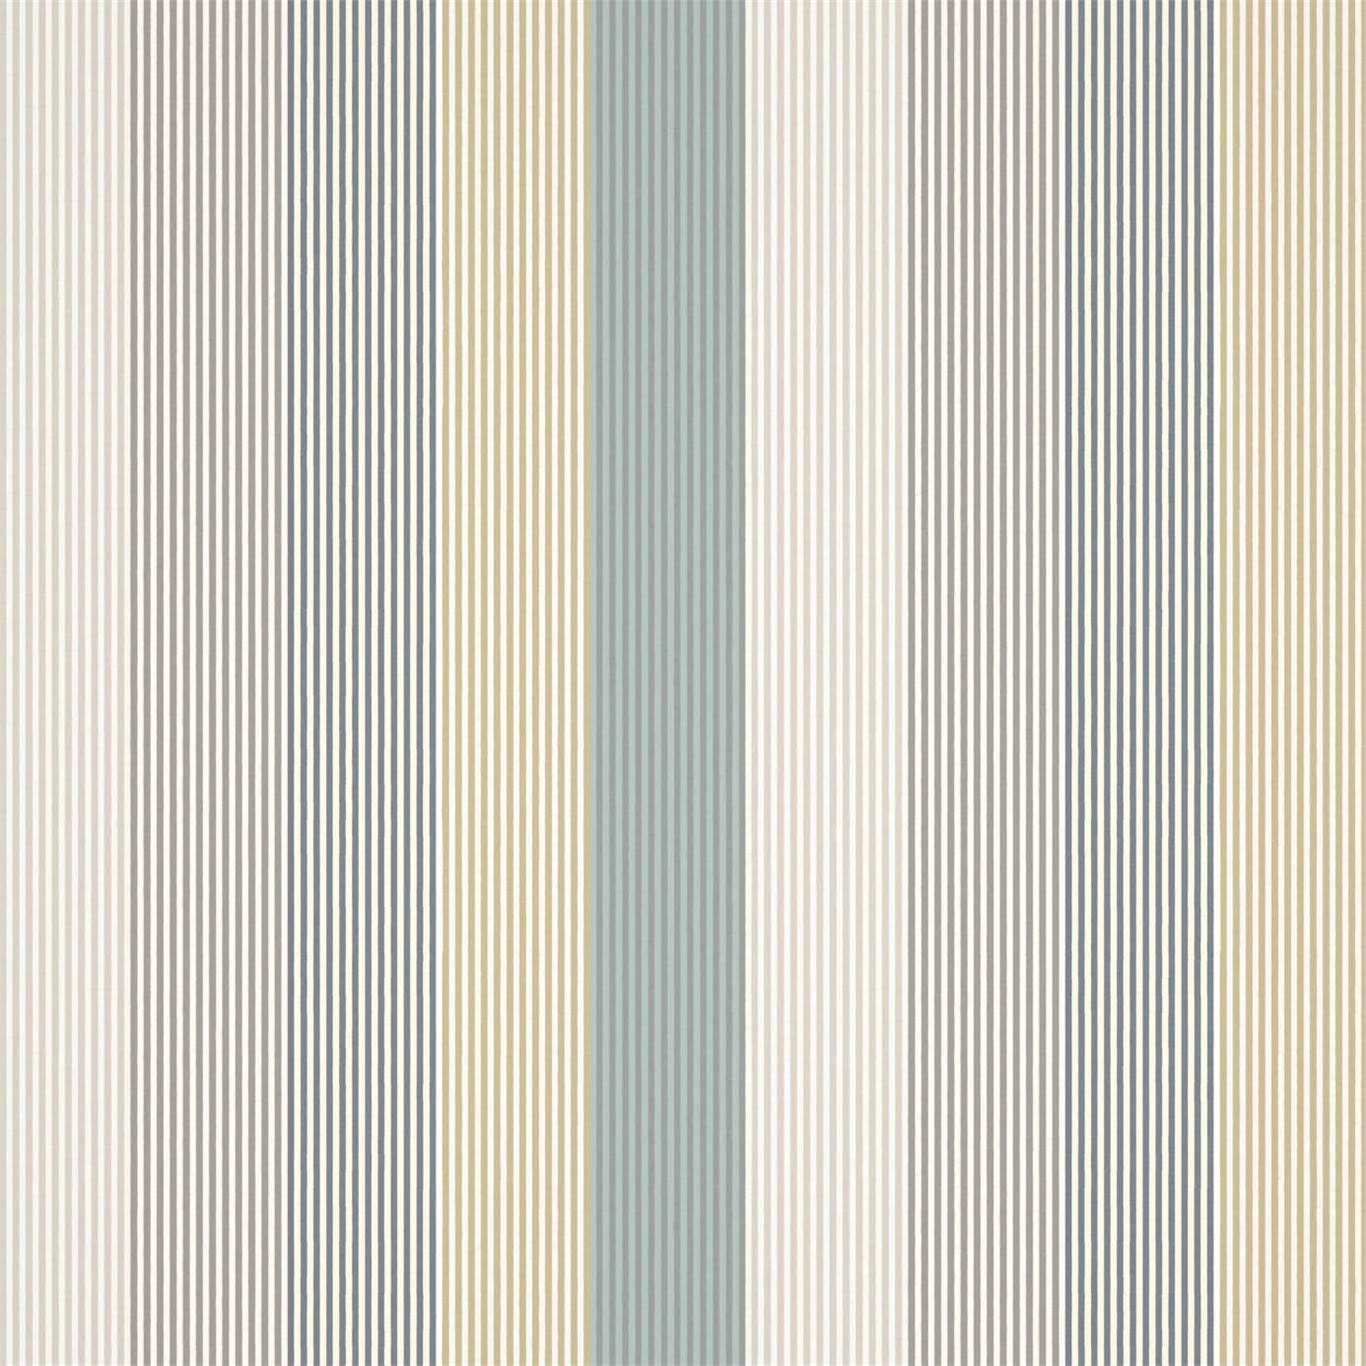 Funfair Stripe by HAR